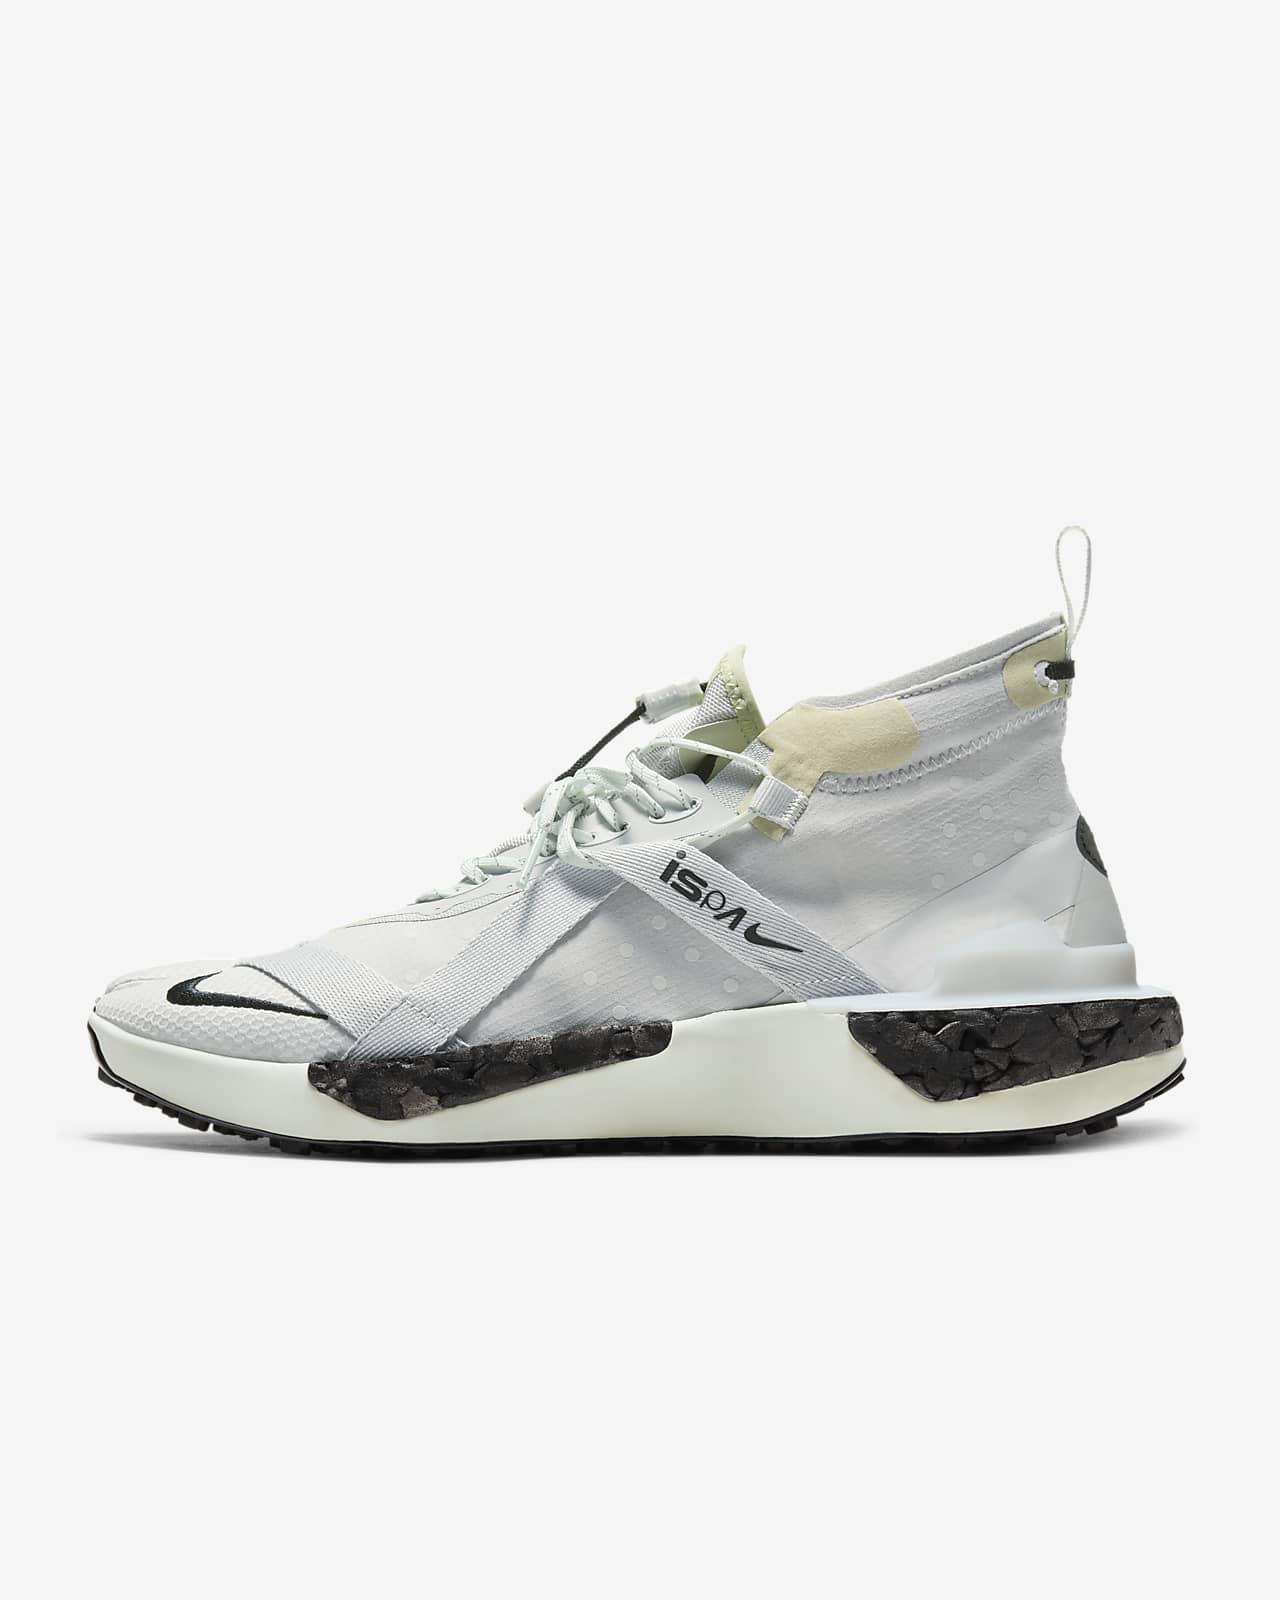 Chaussure Nike ISPA Drifter Split